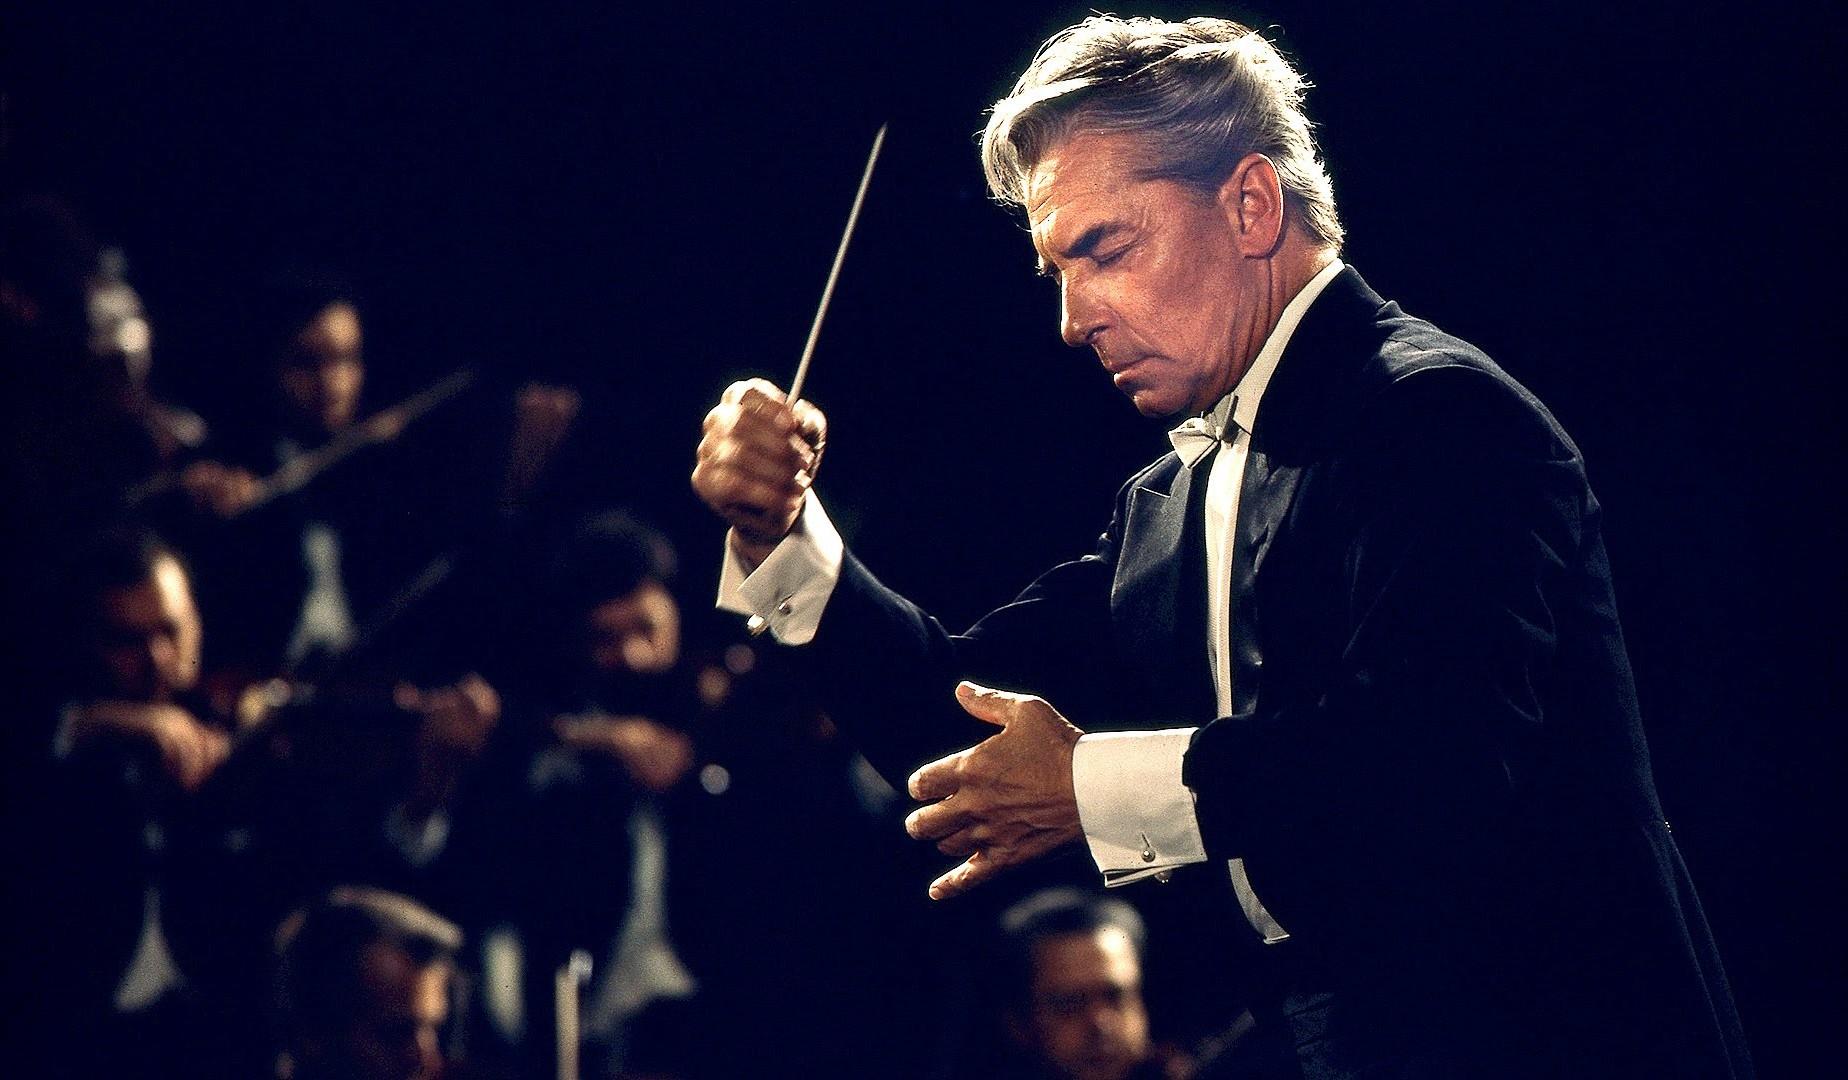 Herbert fon Karajan: Zvuk savršenosti